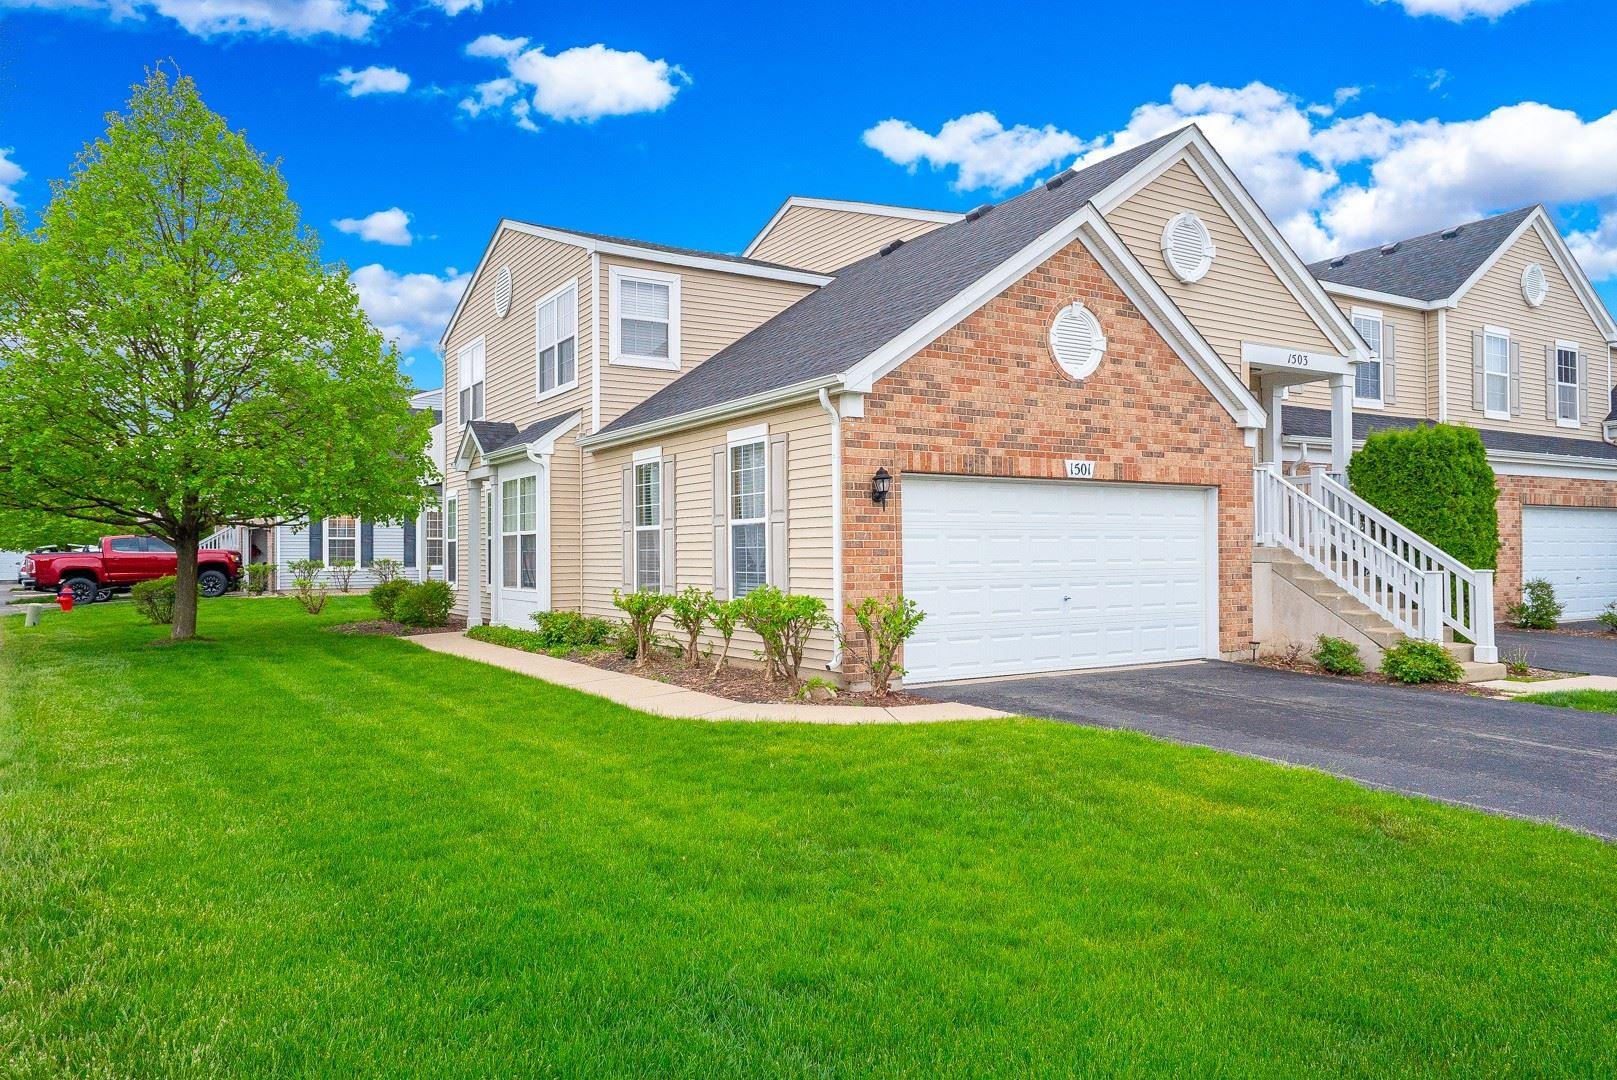 Photo of 1501 Westhampton Drive #1, Plainfield, IL 60586 (MLS # 11080472)